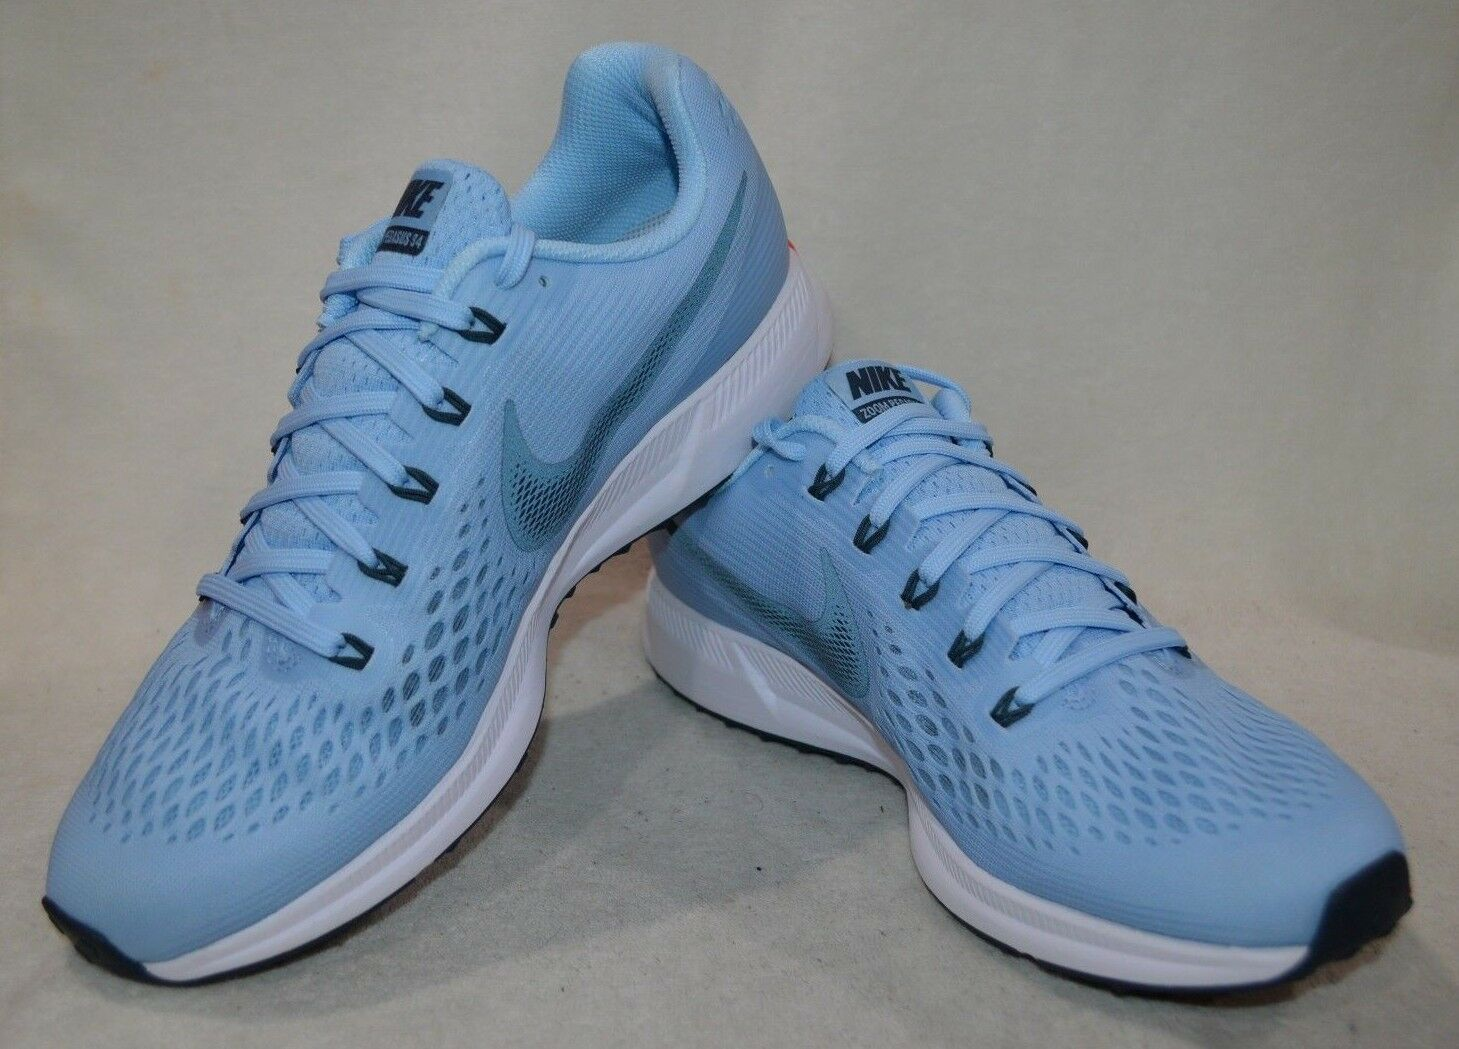 Nike Air Zoom Pegasus 34 Ice blu blu blu blu Fox Uomo Running scarpe-Dimensione 12 13 NWOB c4750c